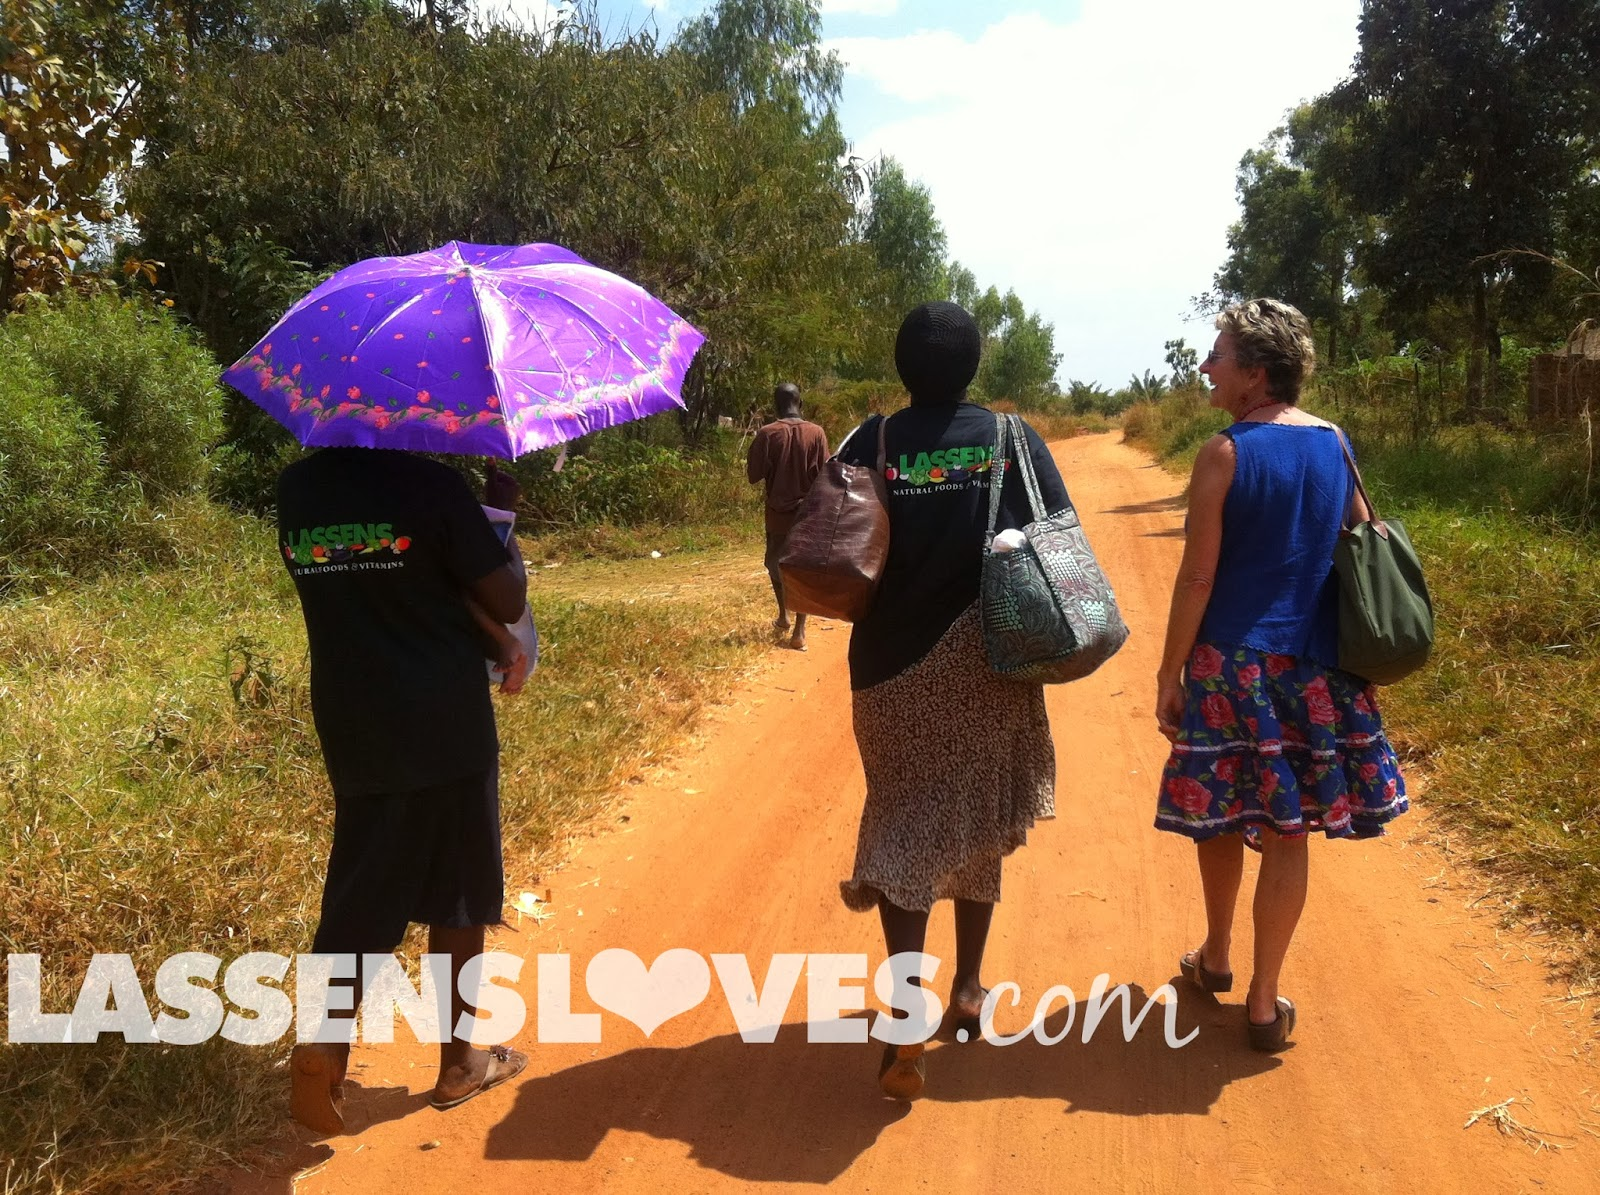 lassensloves.com, Lassen's, Beads+of+Hope, Women+of+Peace, Gulu+Uganda, thrive+gulu